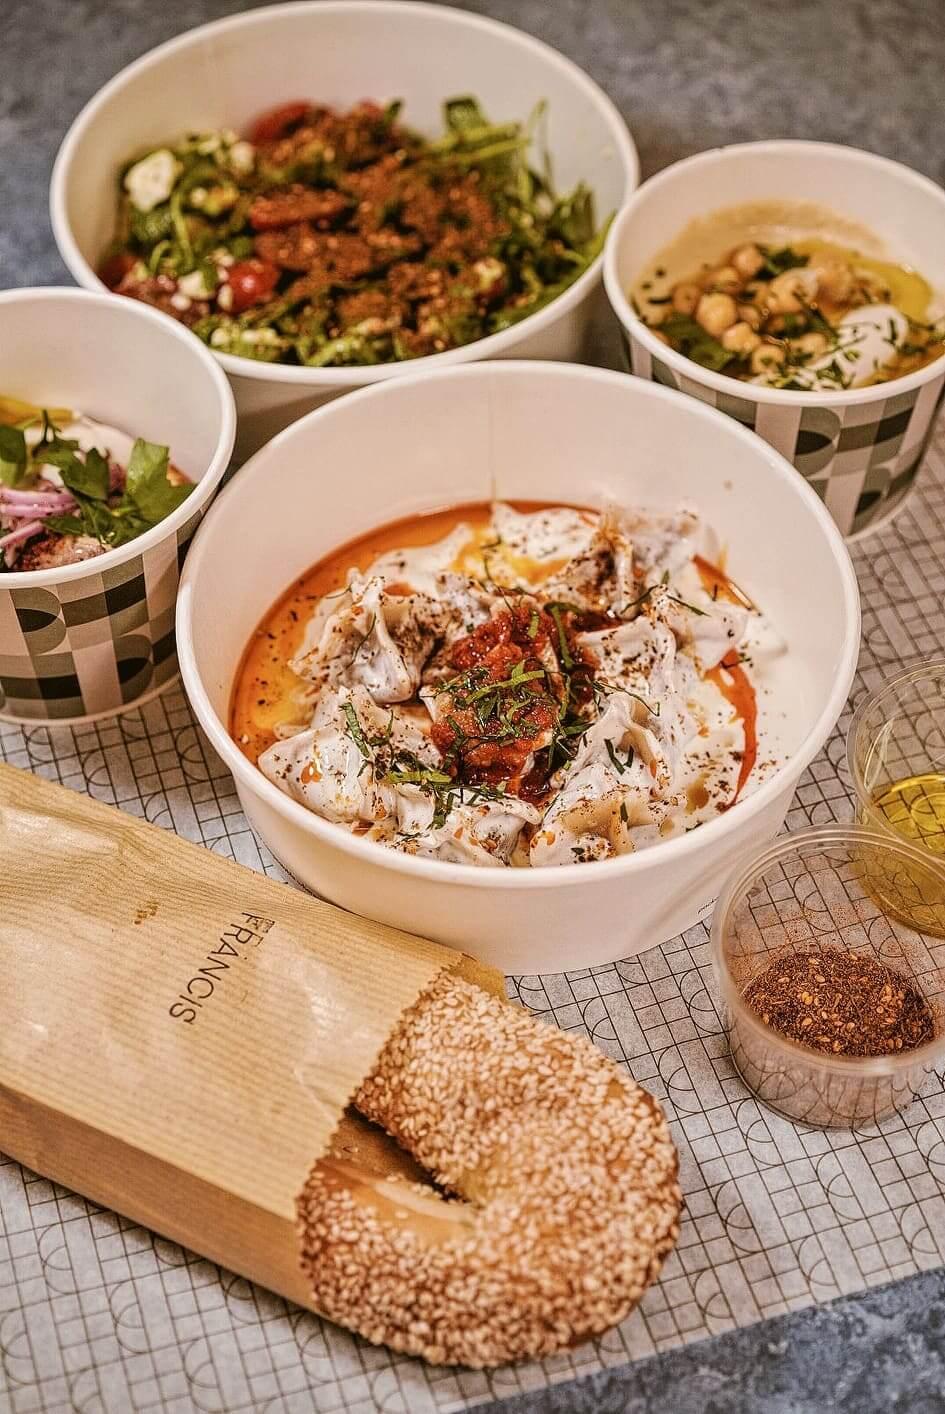 FRANCIS餐飲靈感源自以色列特拉維夫嘅街頭美食。